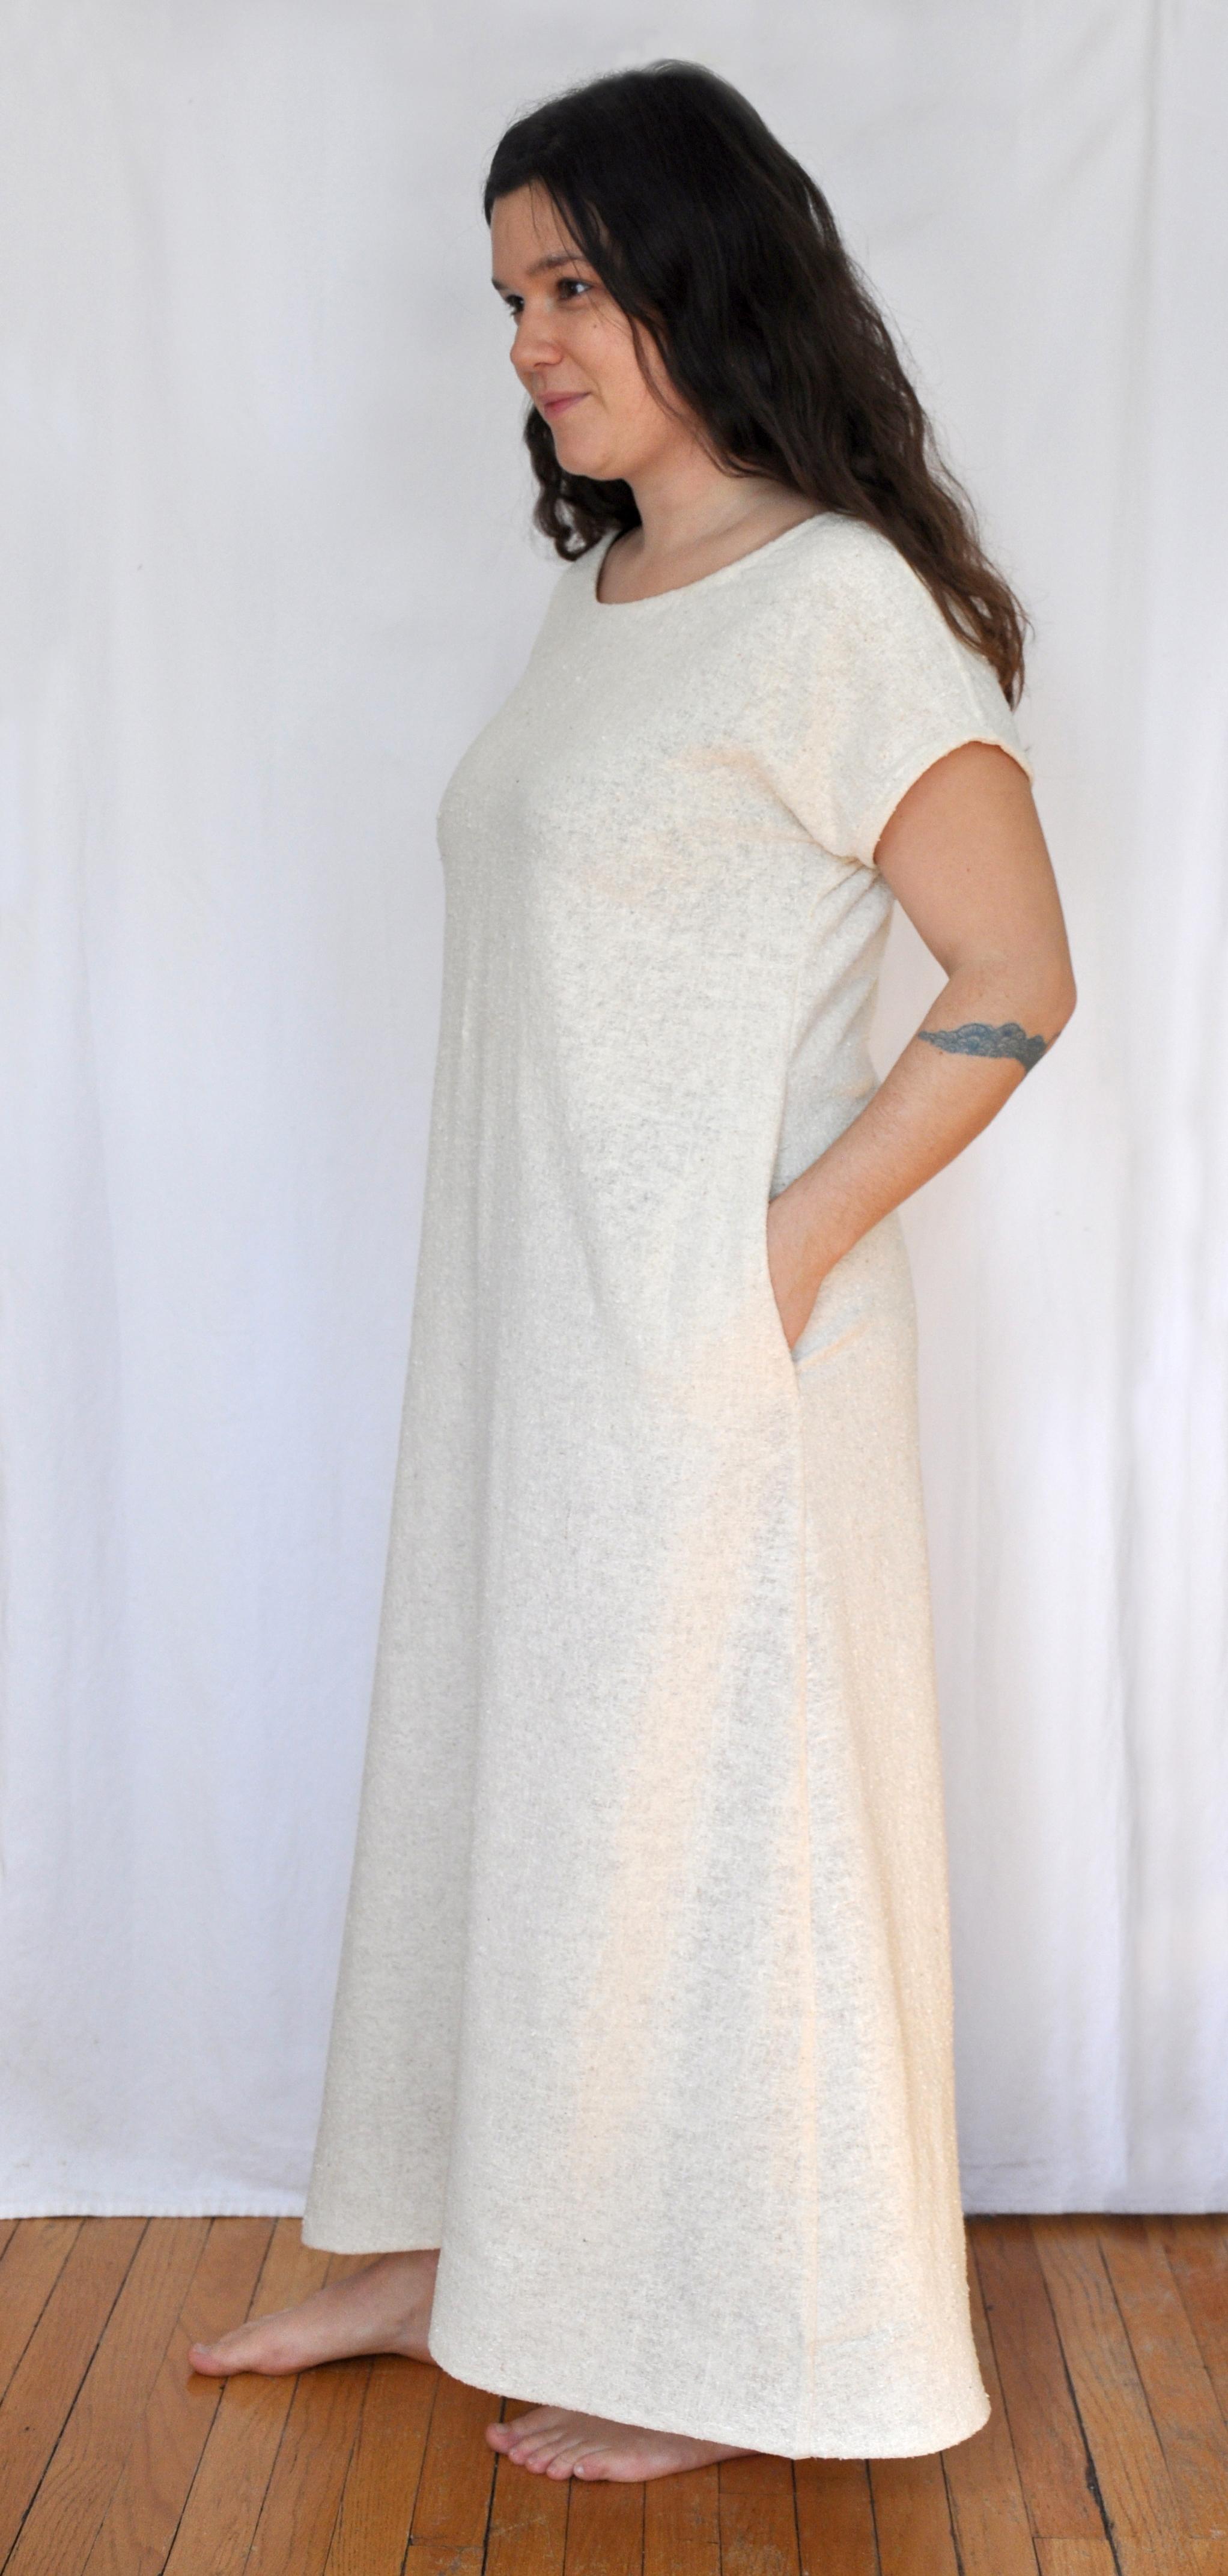 Megan_weddinggown.jpg